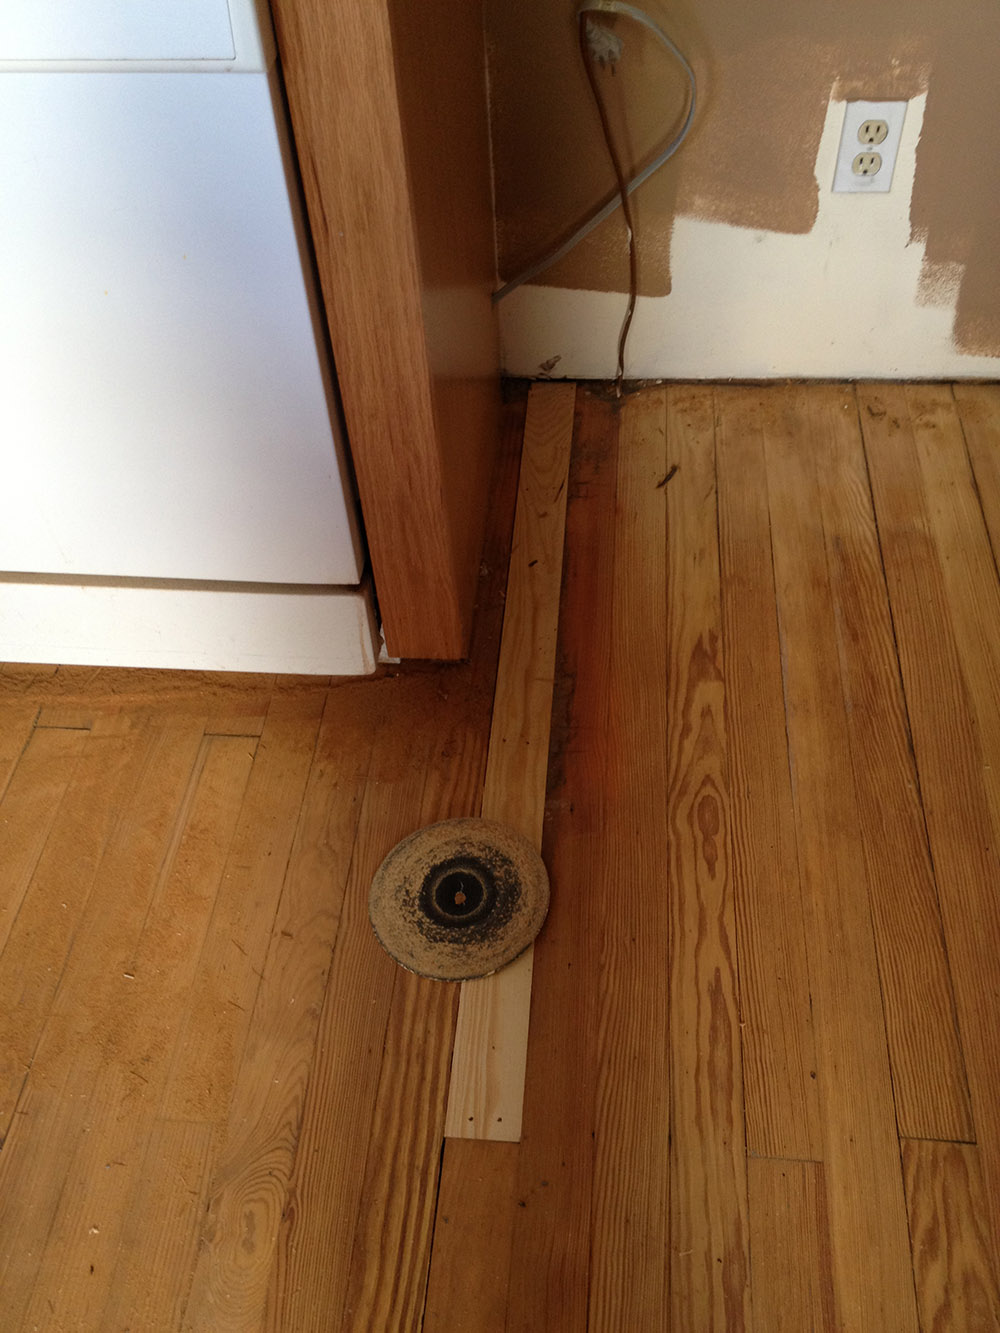 Replacing Hardwood Floor Boards ~ Mudroom renovation hardwood floors refinished more